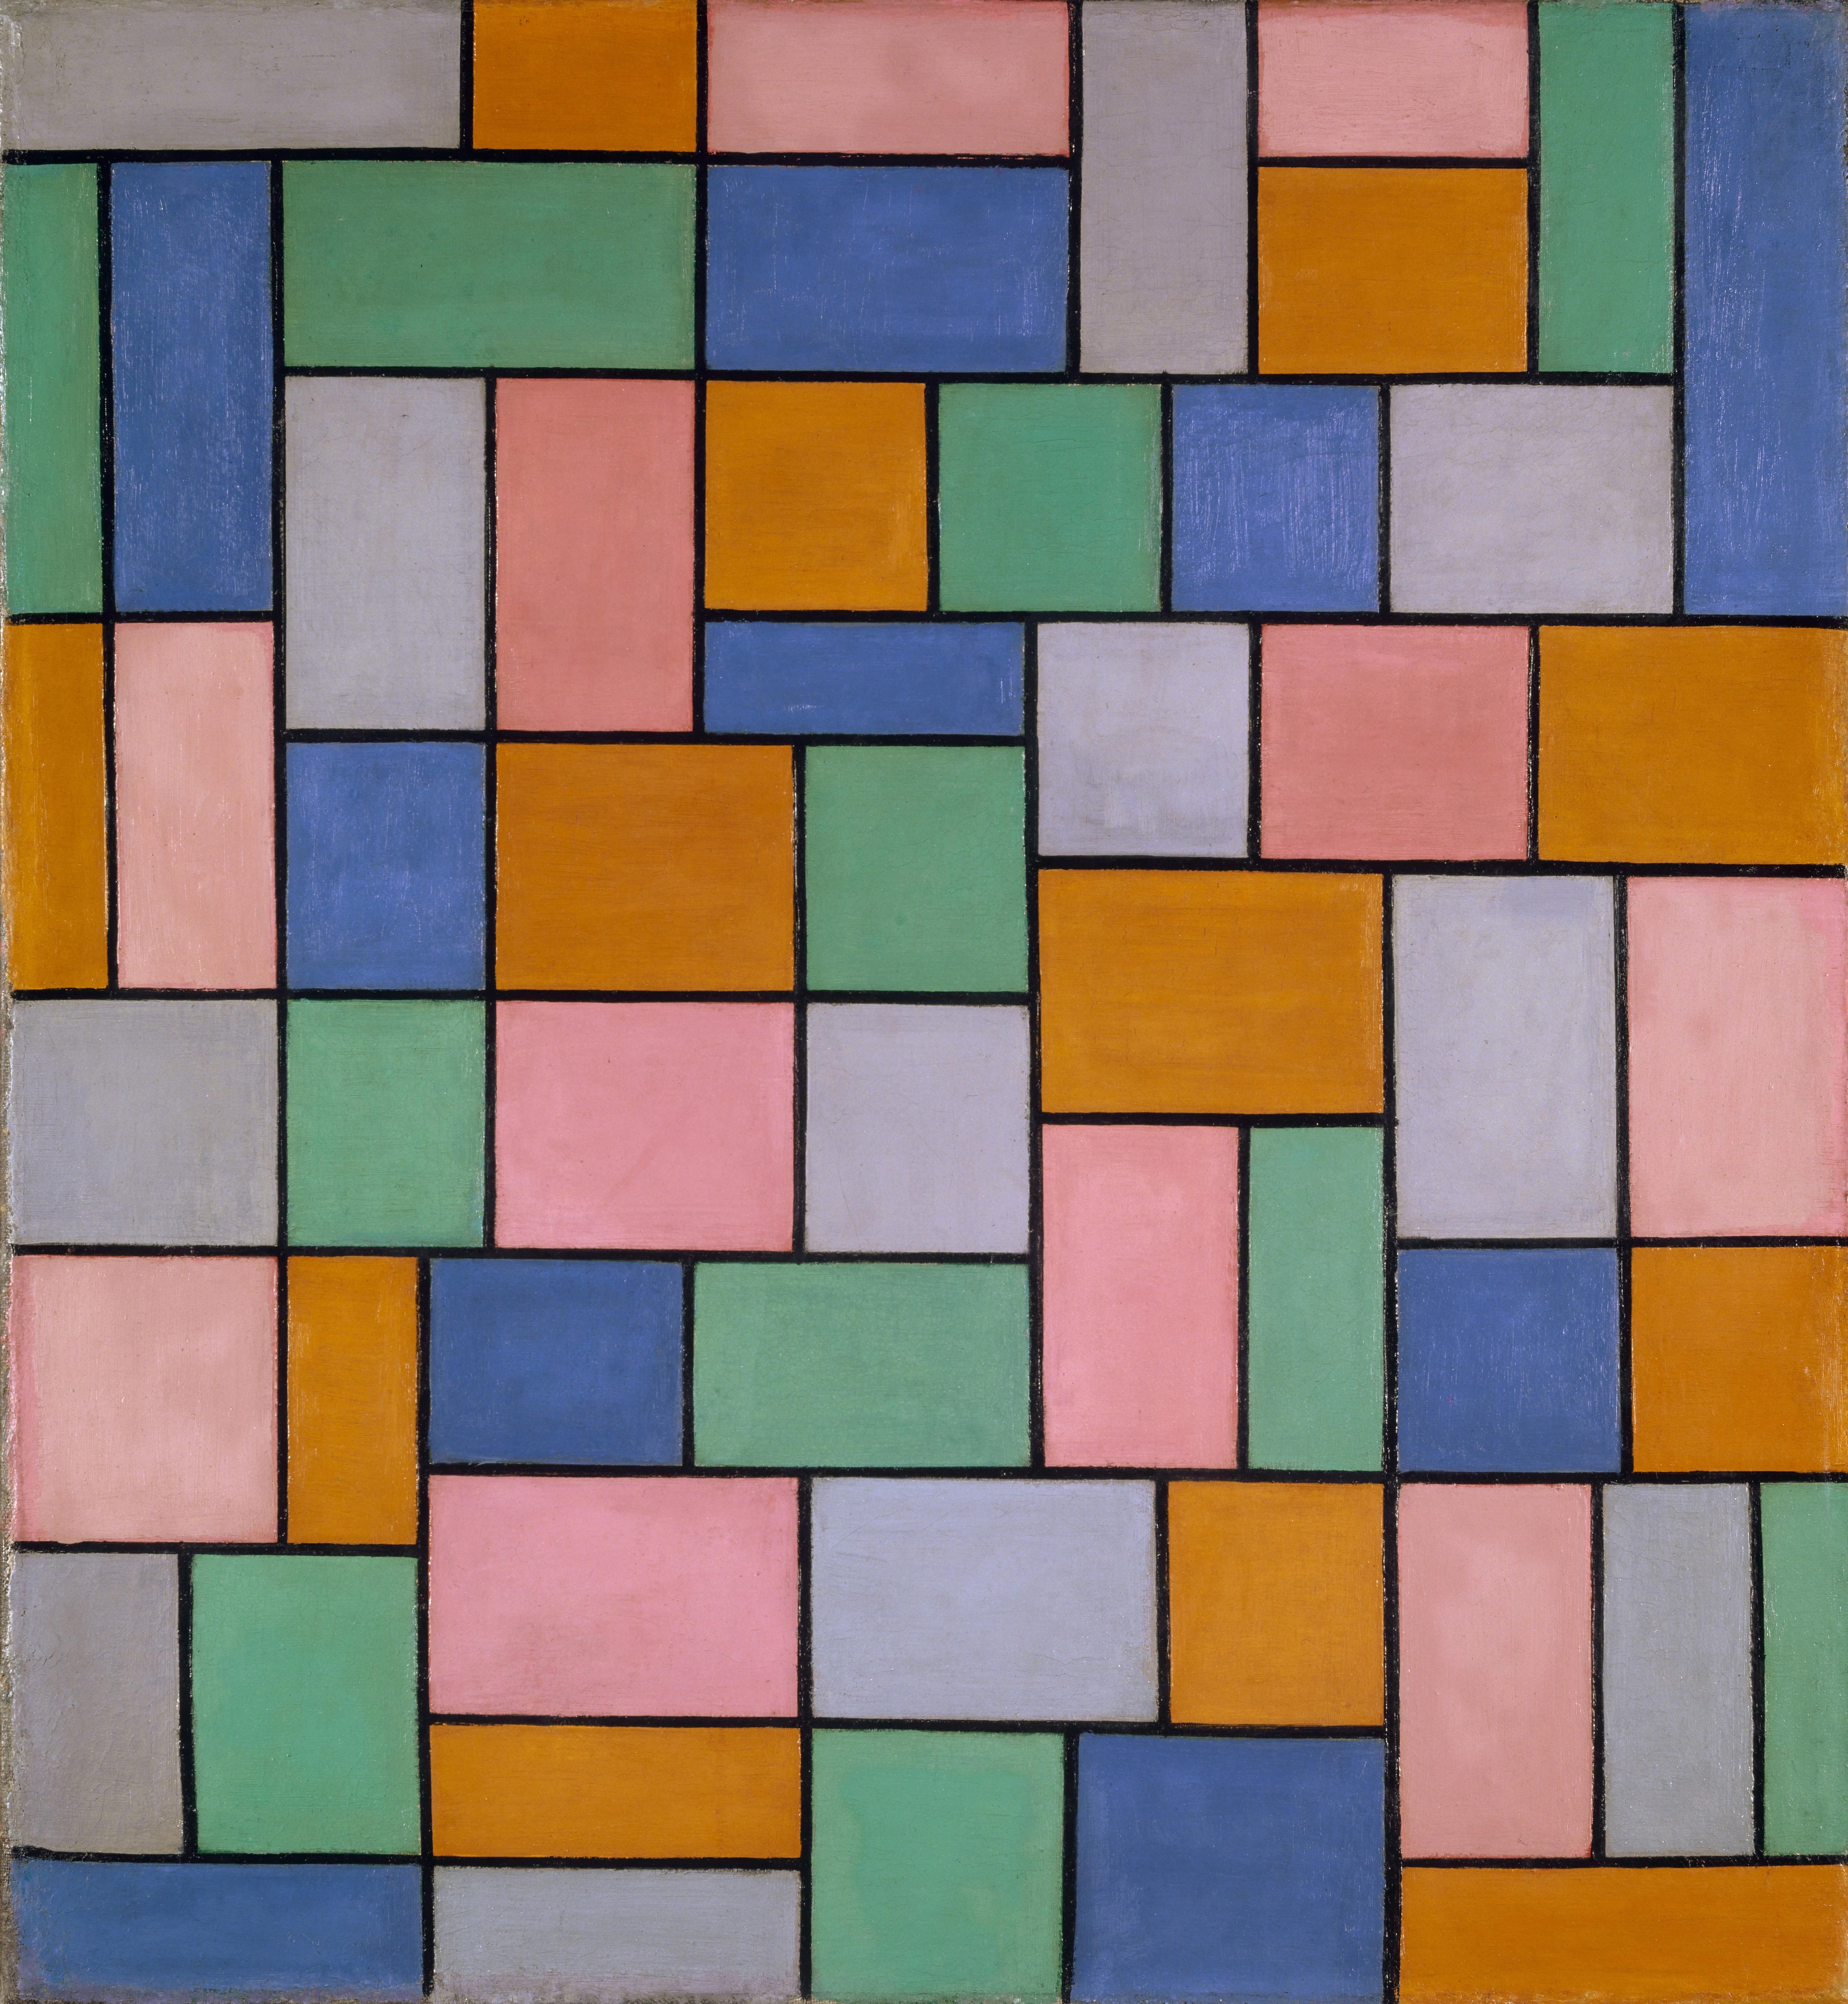 Compositie in dissonanten - Wikipedia